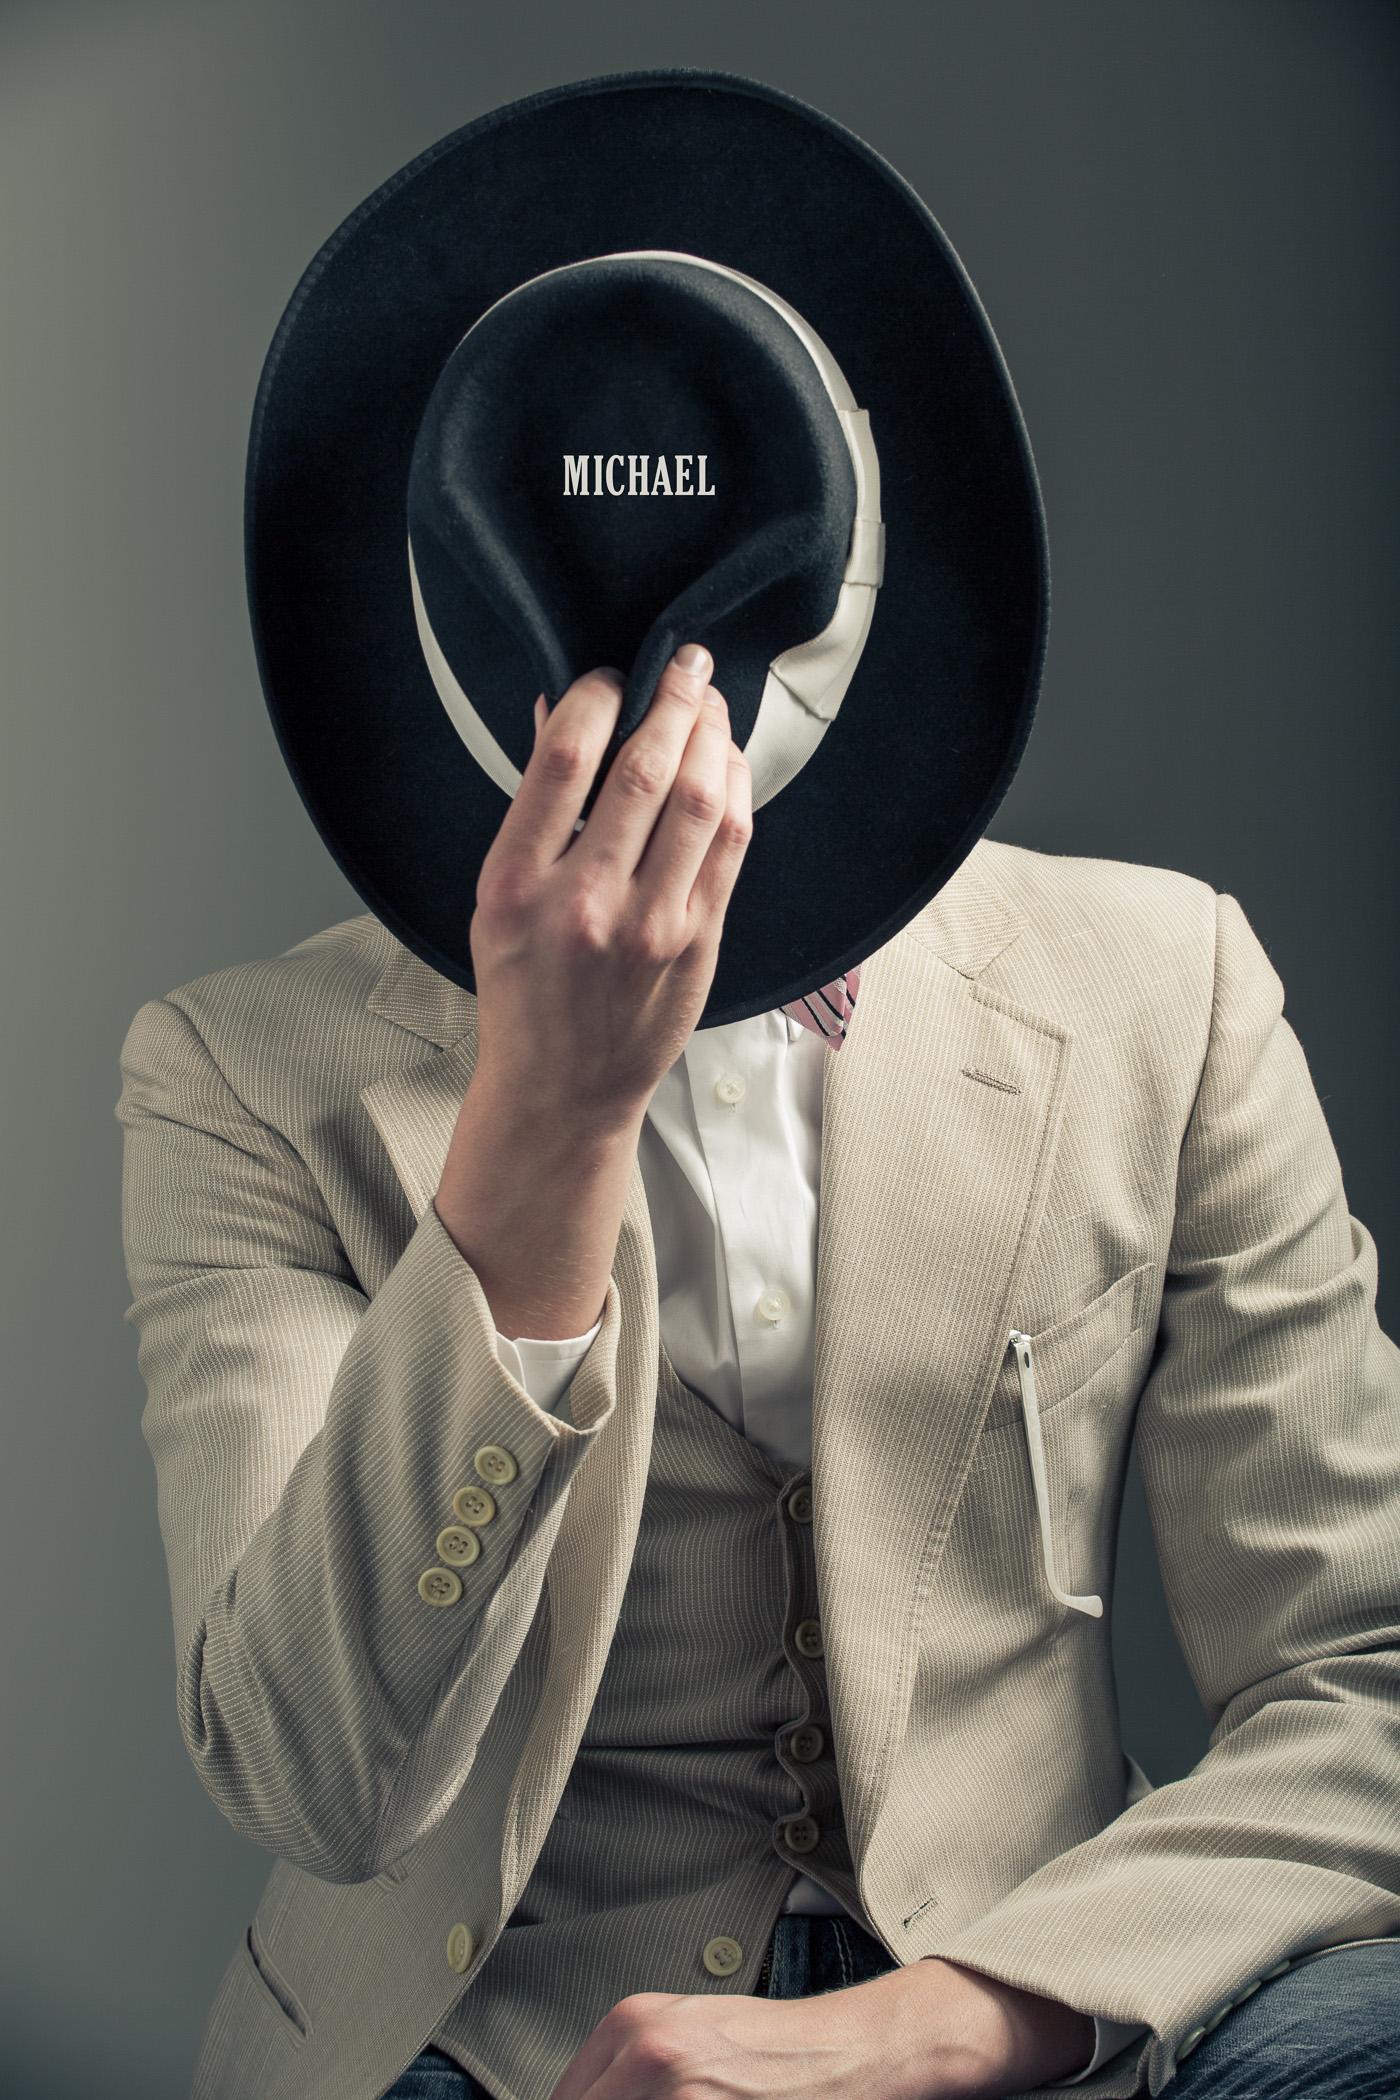 michael-1